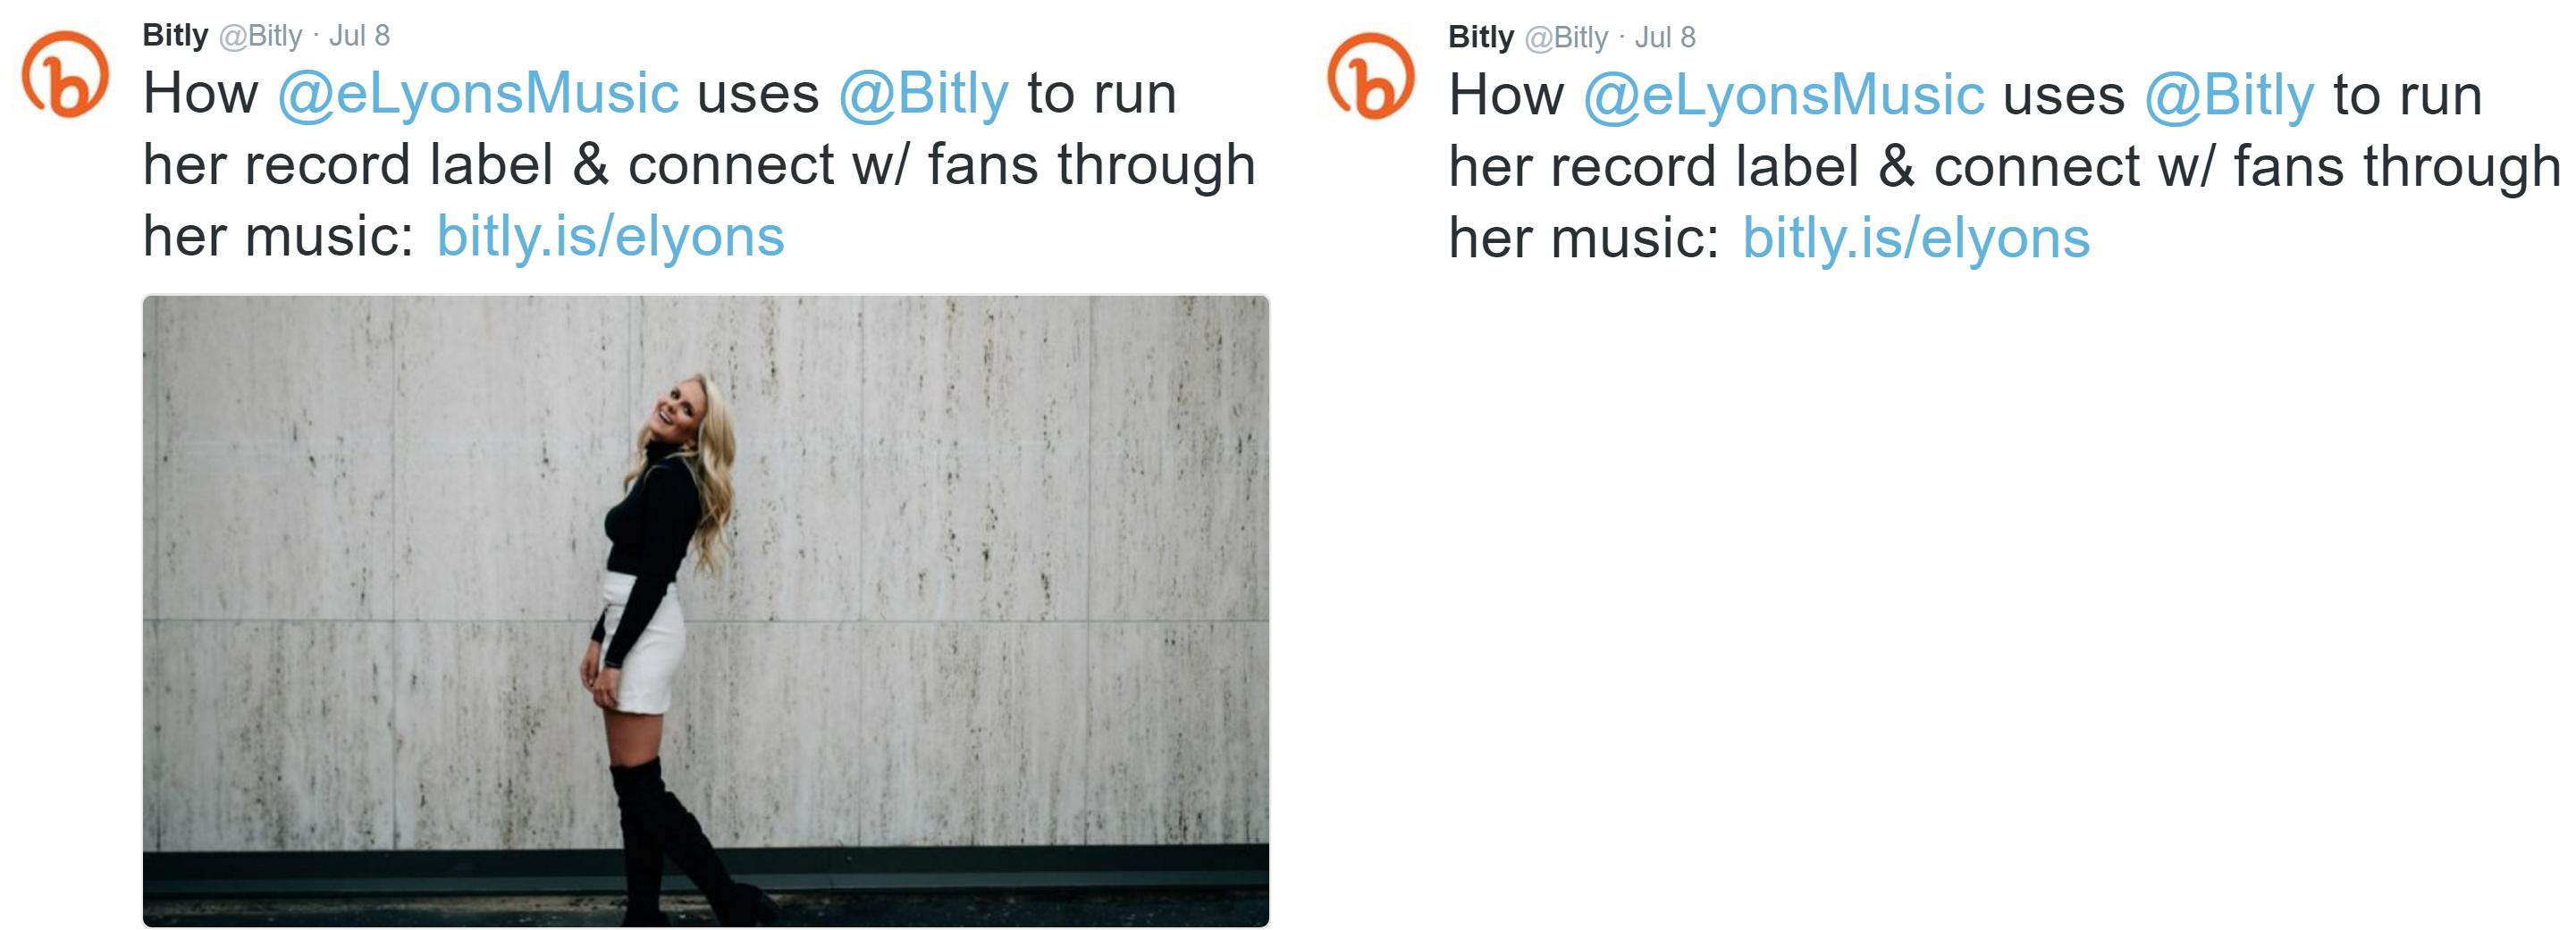 Bitly Tweet